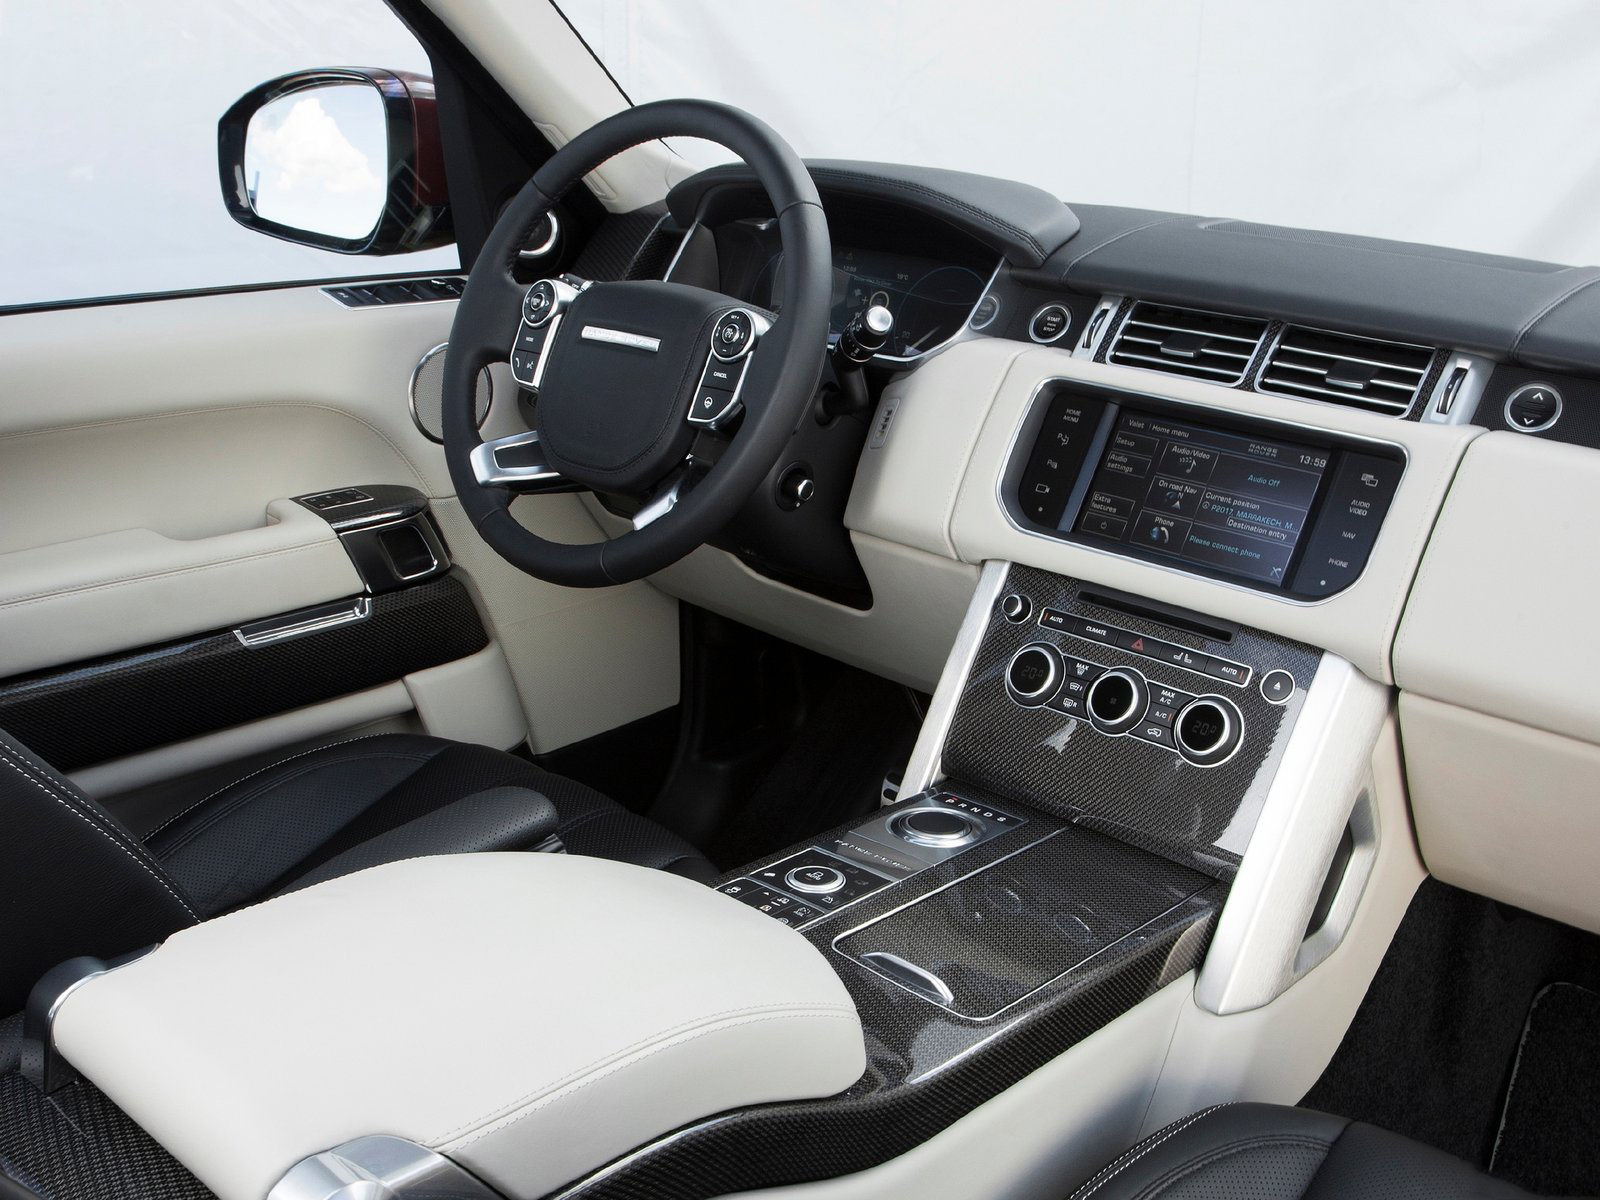 Automotive Database: Range Rover (L405)